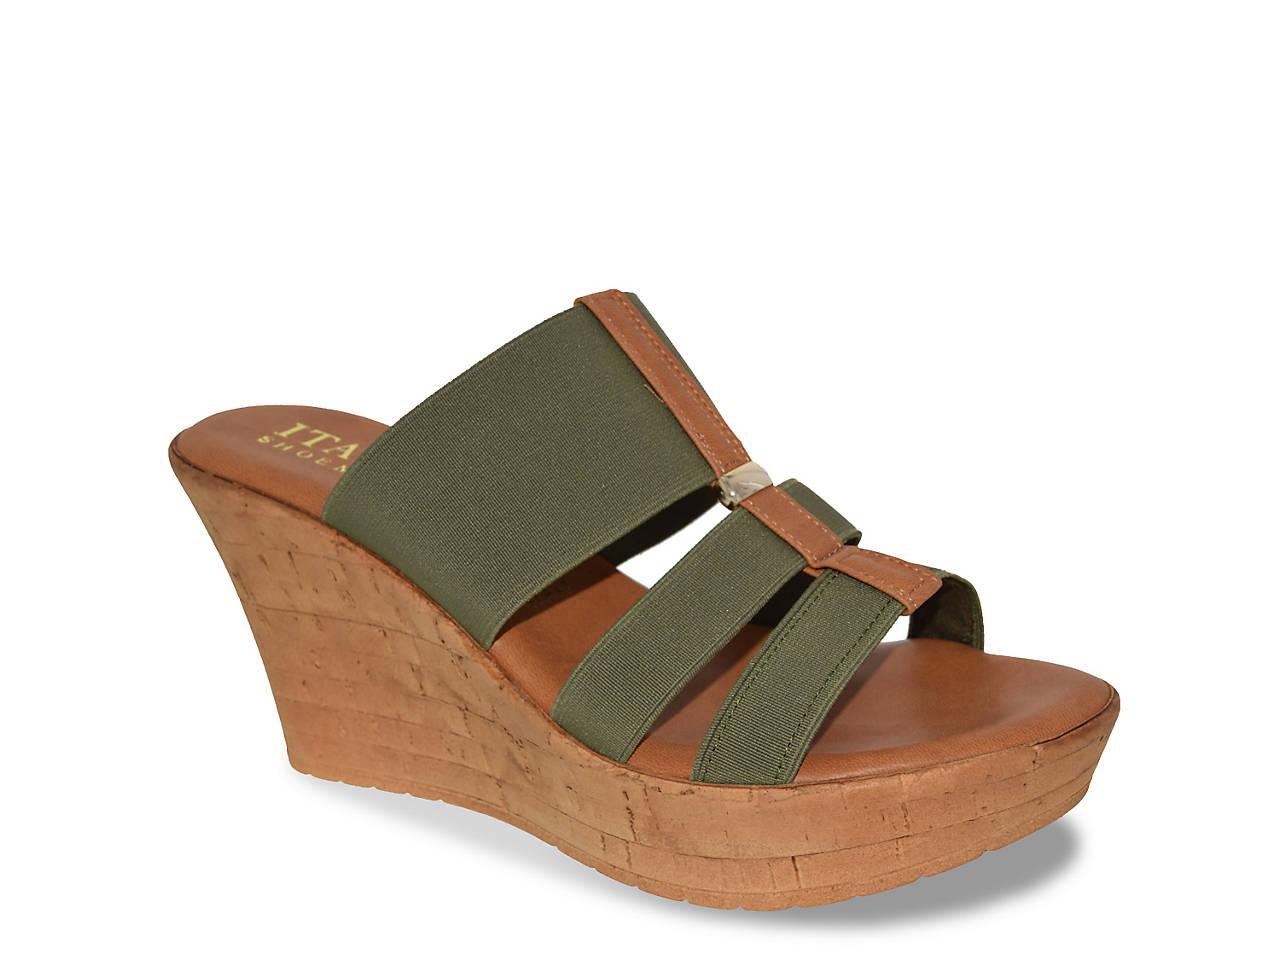 Vali Wedge Sandal by Italian Shoemakers